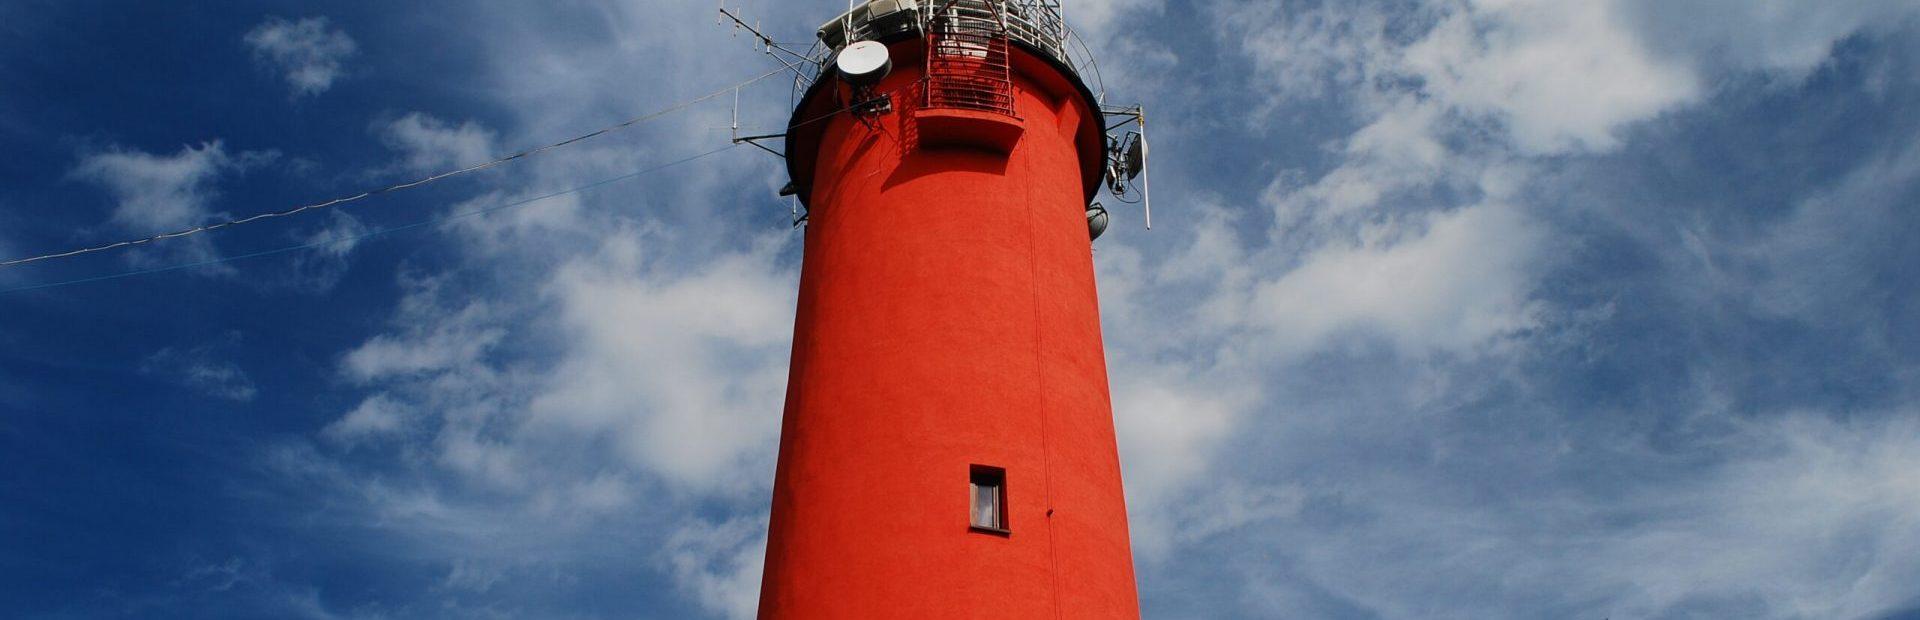 The Krynica Morska lighthouse